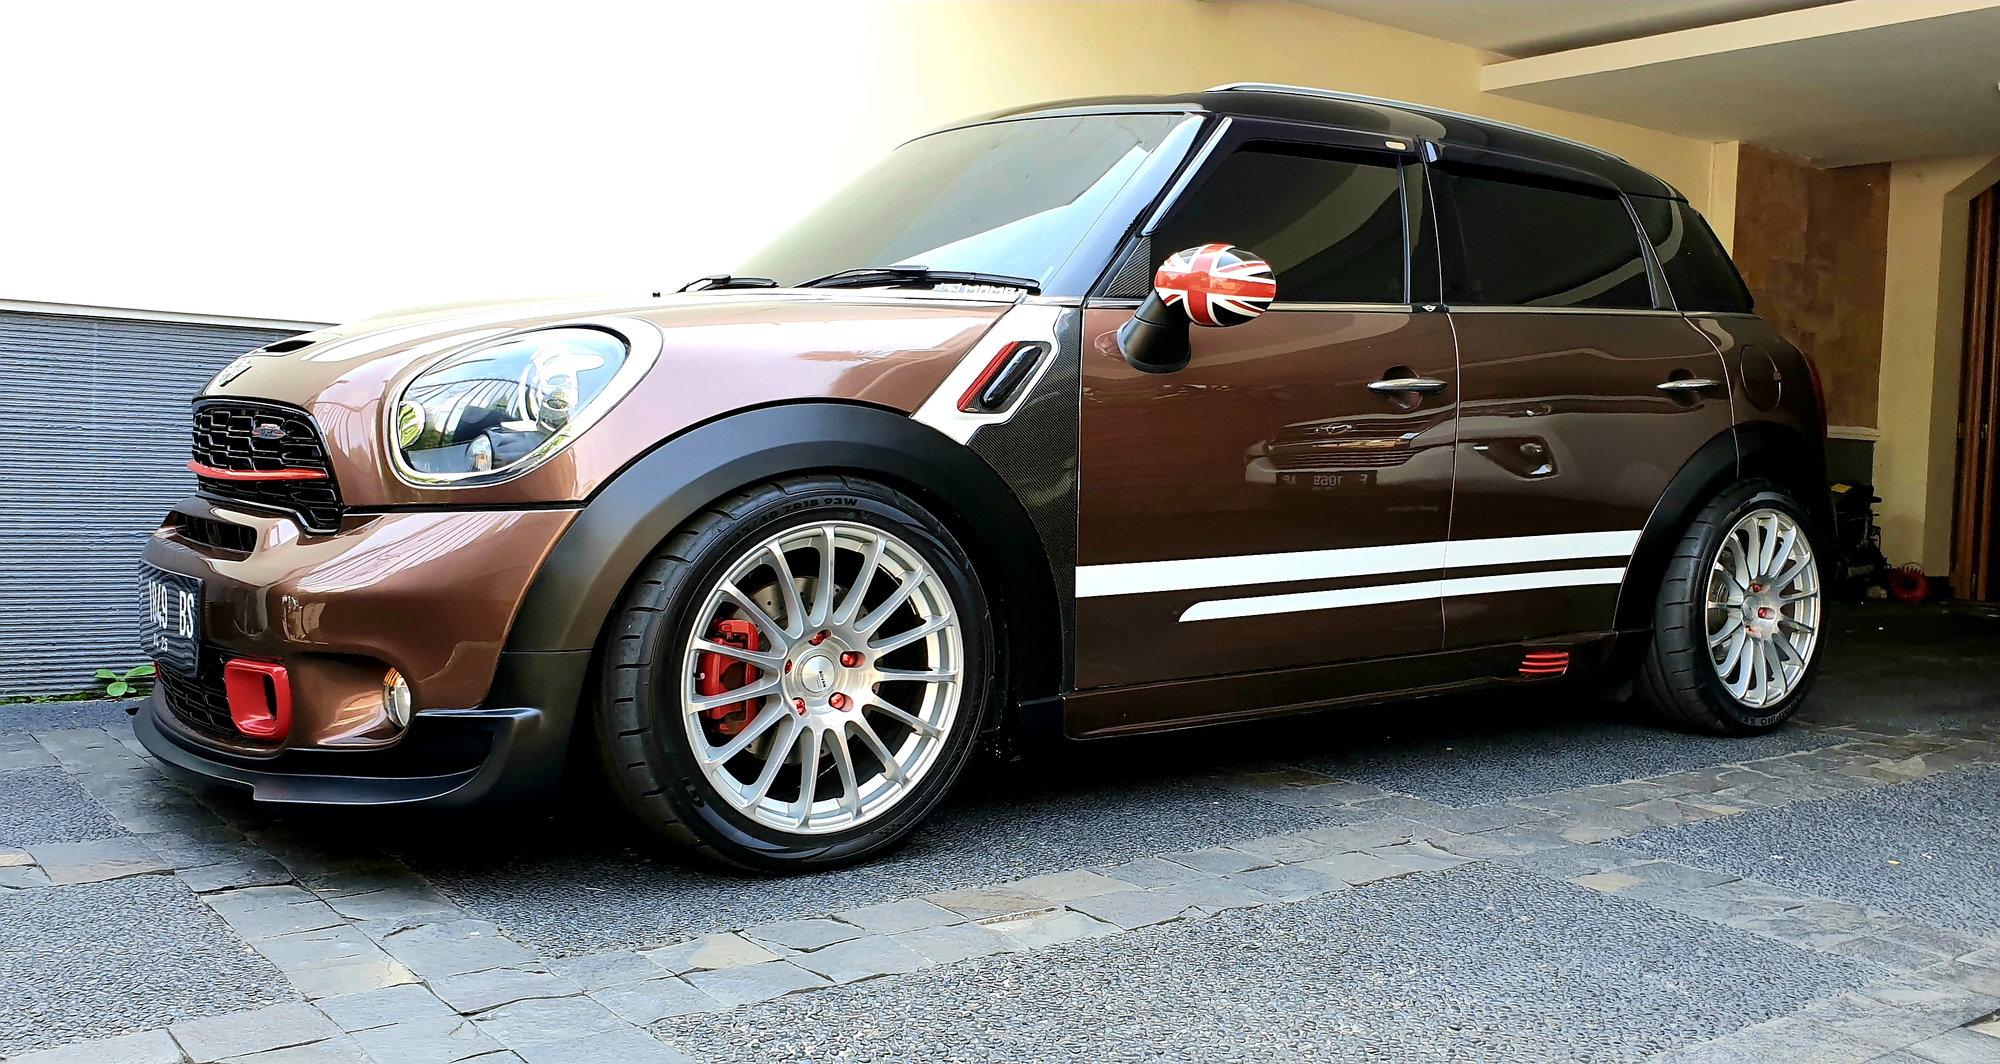 My 300hp Turbo Swap Mini Countryman S R60 Manic Stage 3 With Mamba Turbo